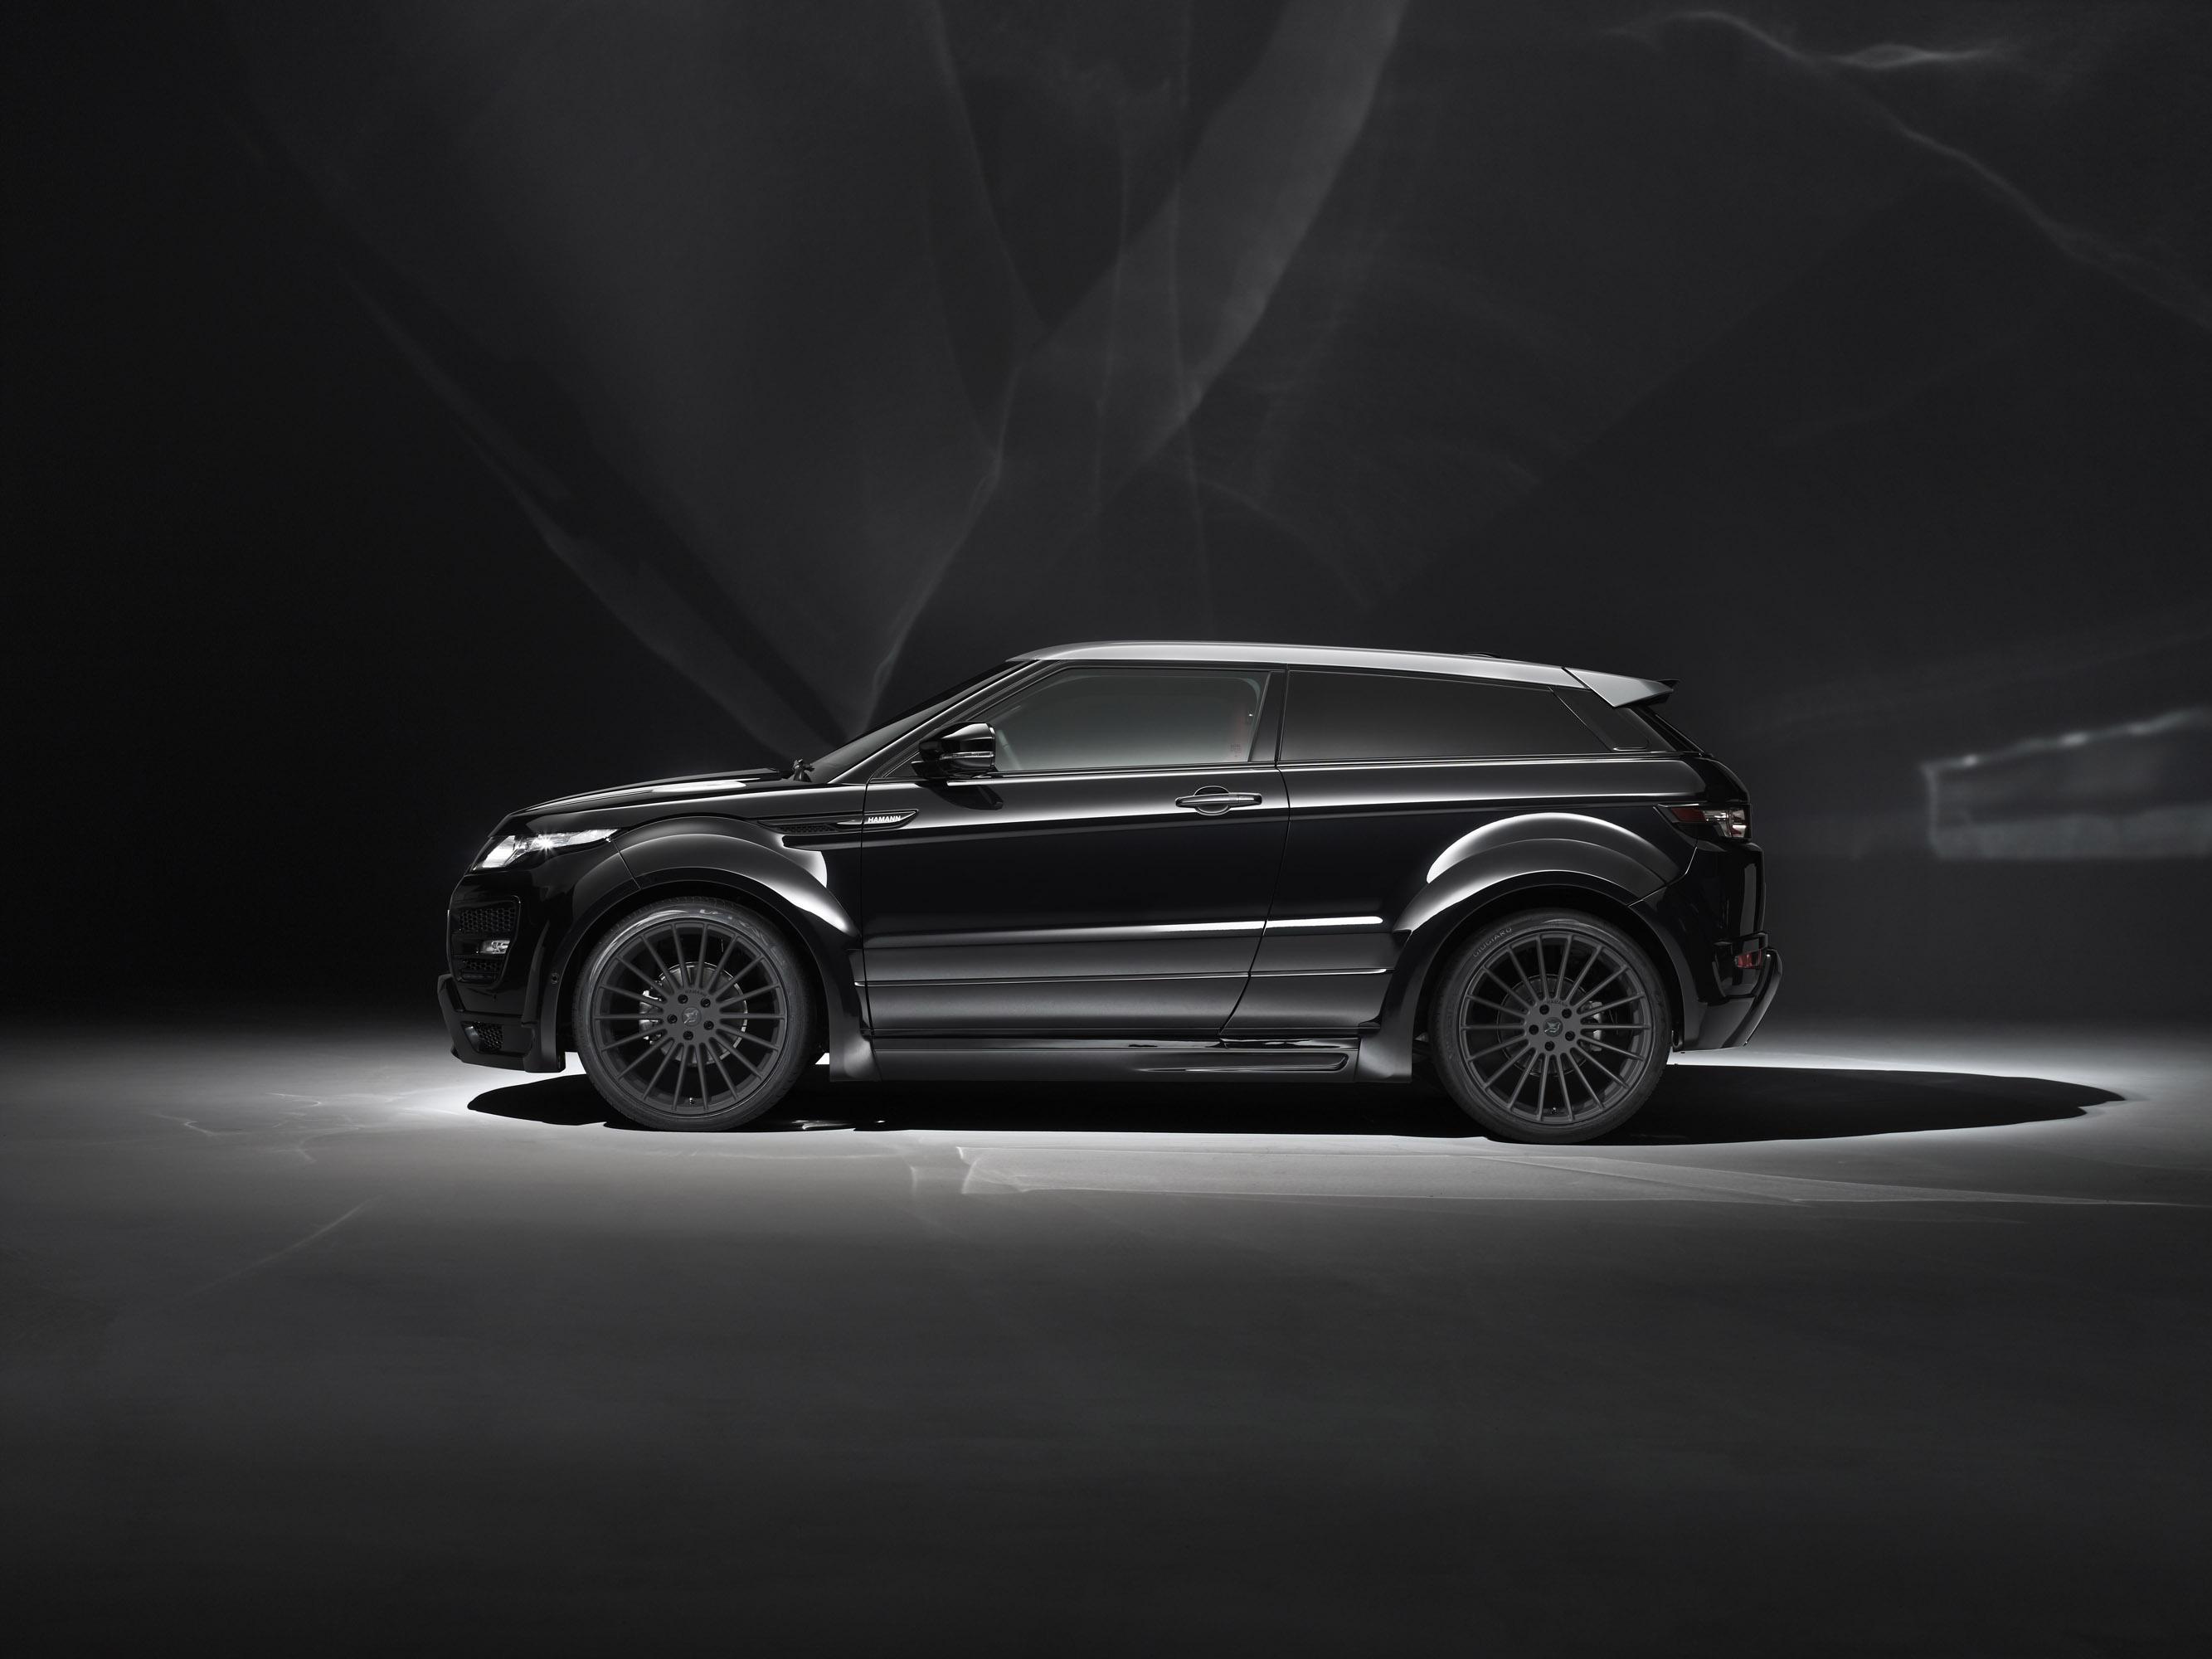 hamann 2012 range rover evoque picture 71205. Black Bedroom Furniture Sets. Home Design Ideas